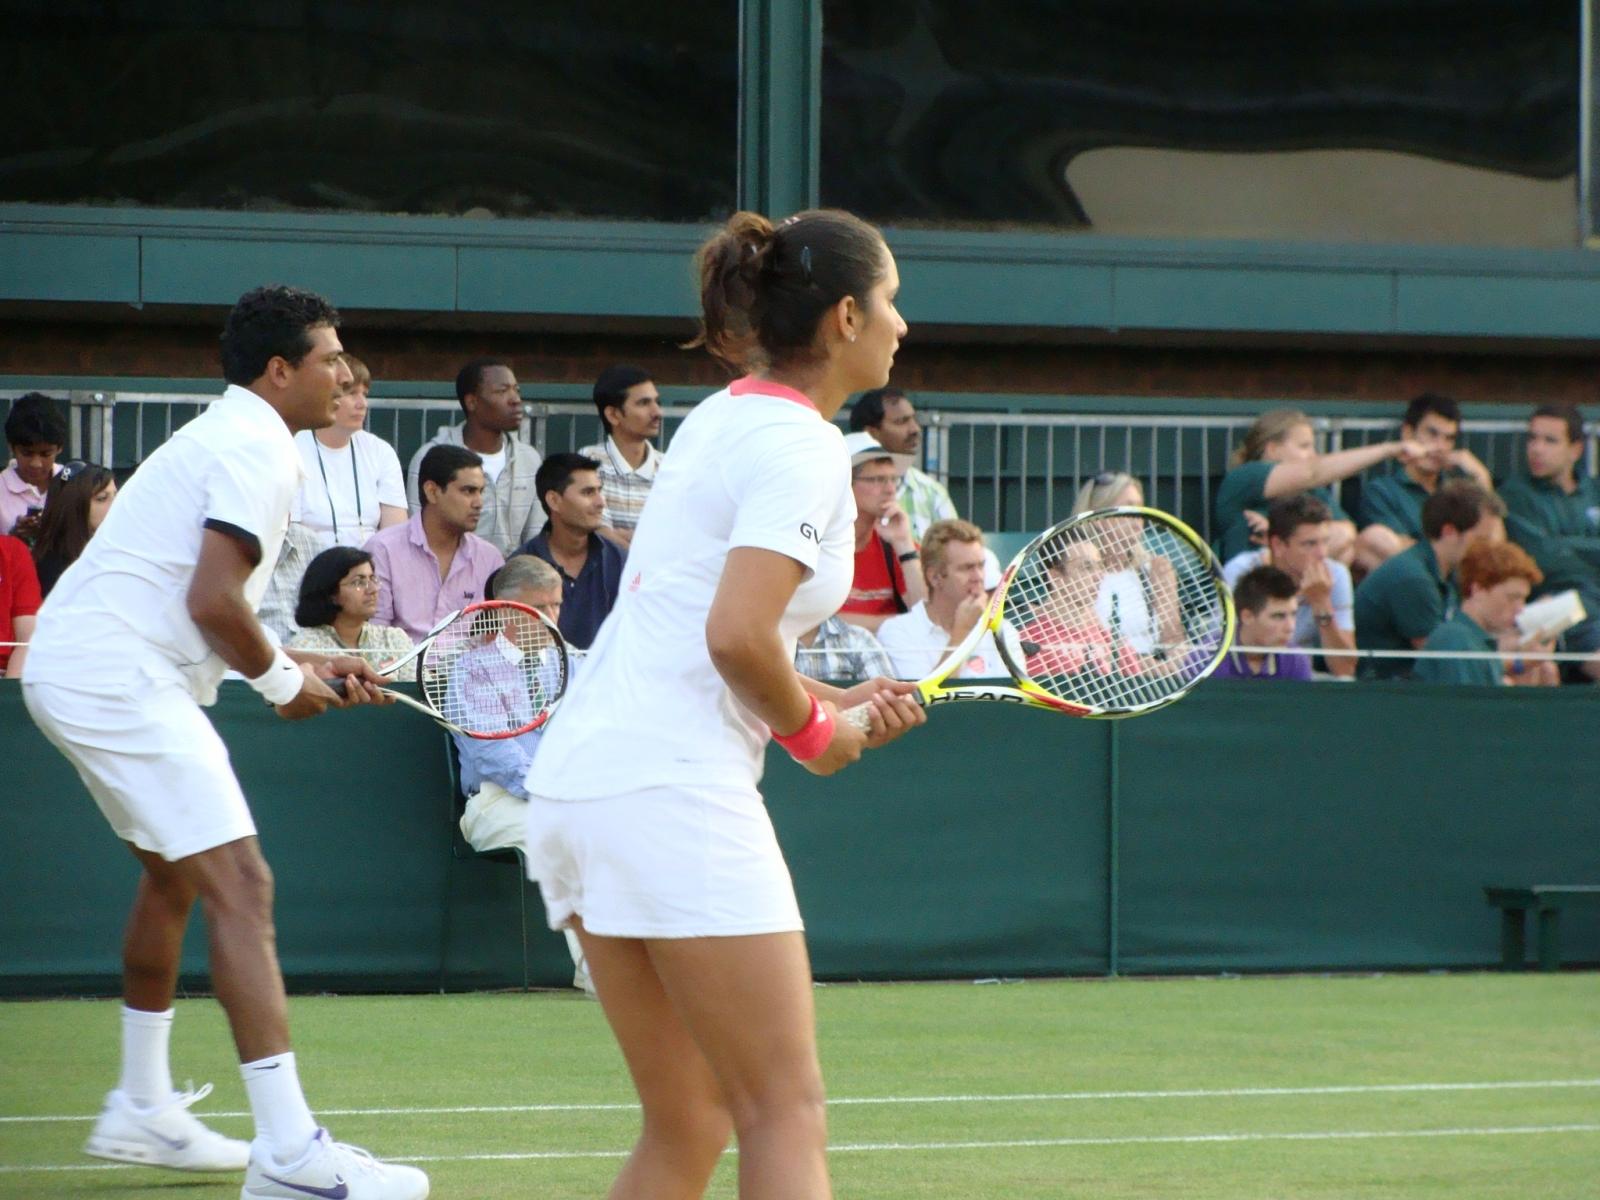 25_Bhupathi Mirza Wimbledon 2009